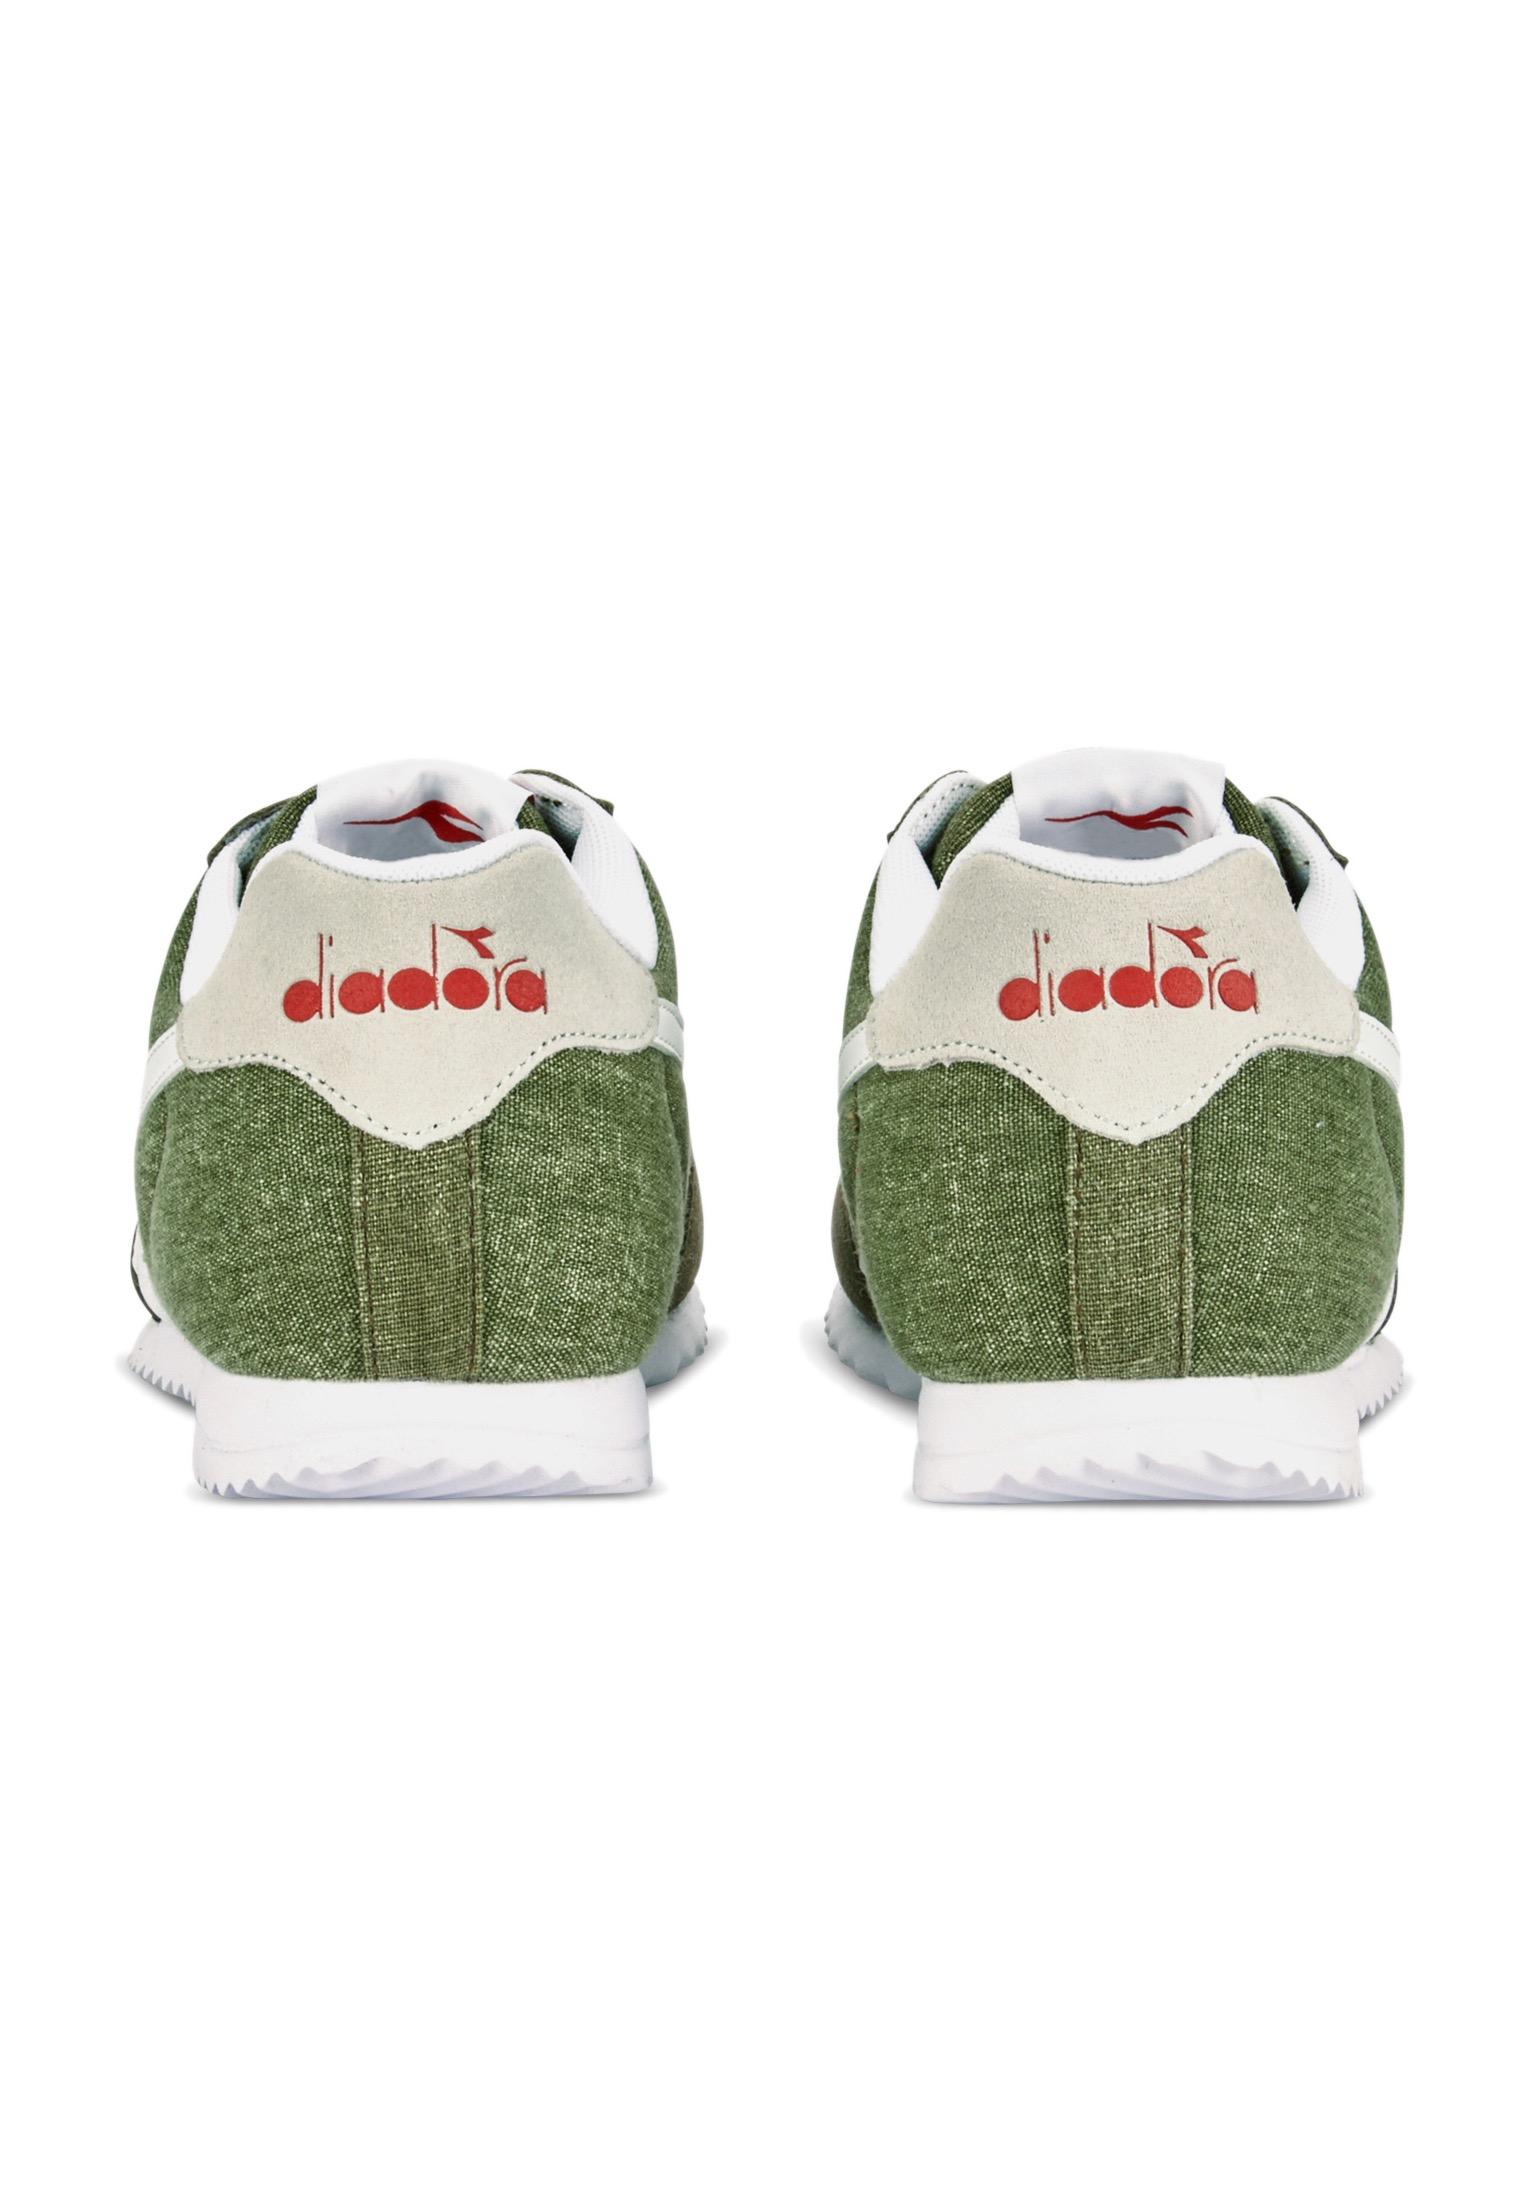 Scarpe-Diadora-Jog-Light-C-Sneakers-sportive-uomo-donna-vari-colori-e-taglie miniatura 48